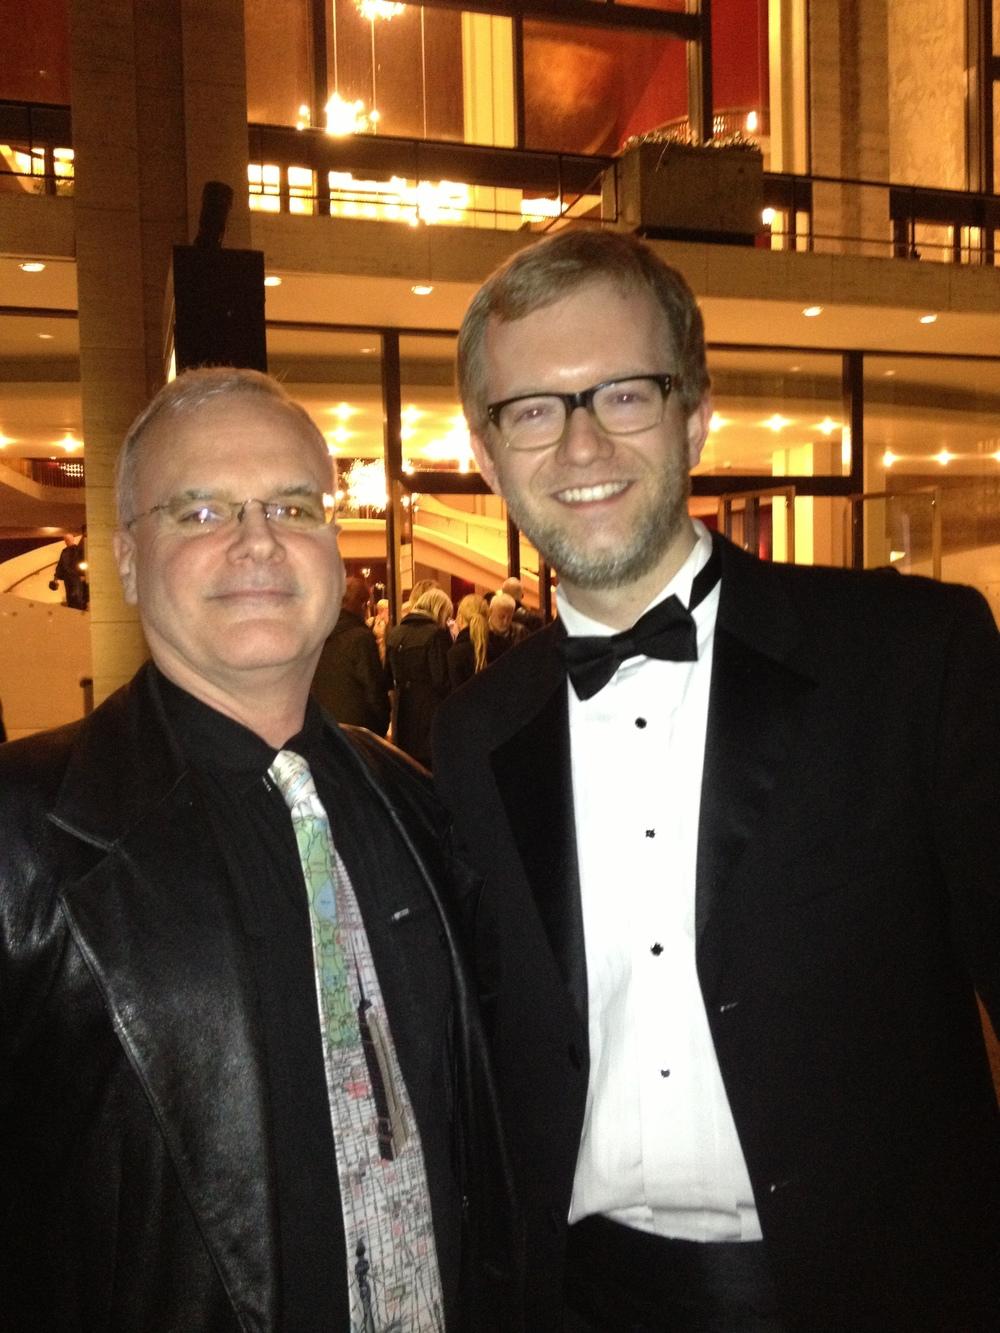 Daniel McCaughan and principal timpanist Jason Haaheim in Lincoln Center Plaza